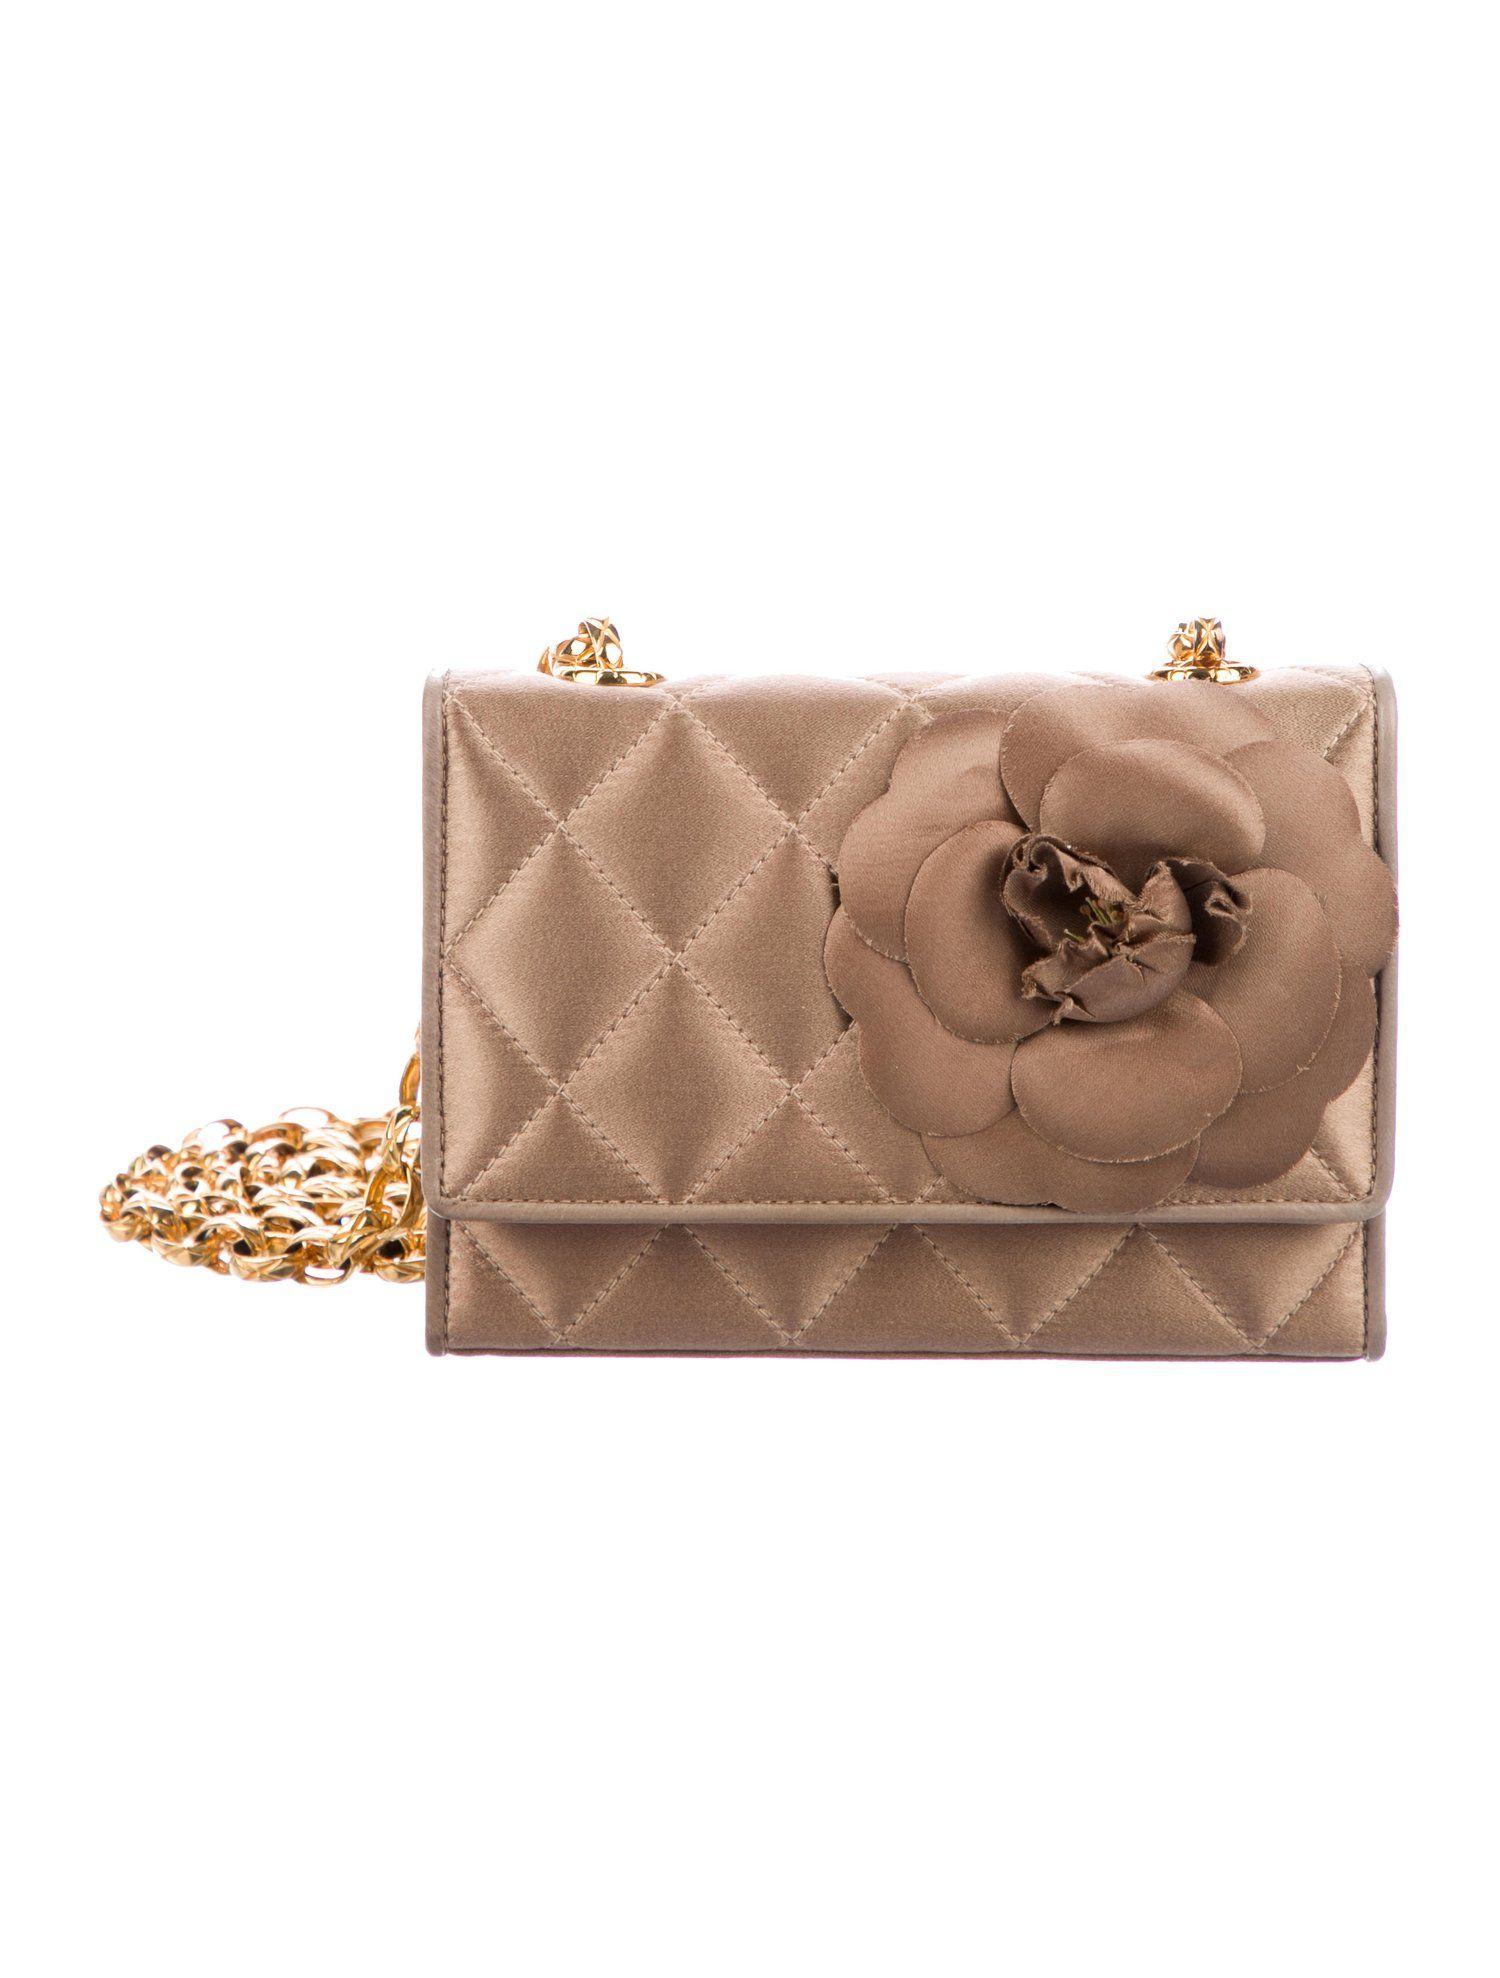 b3895b381b04 Chanel Satin Camellia Flap Bag - Handbags - CHA319698